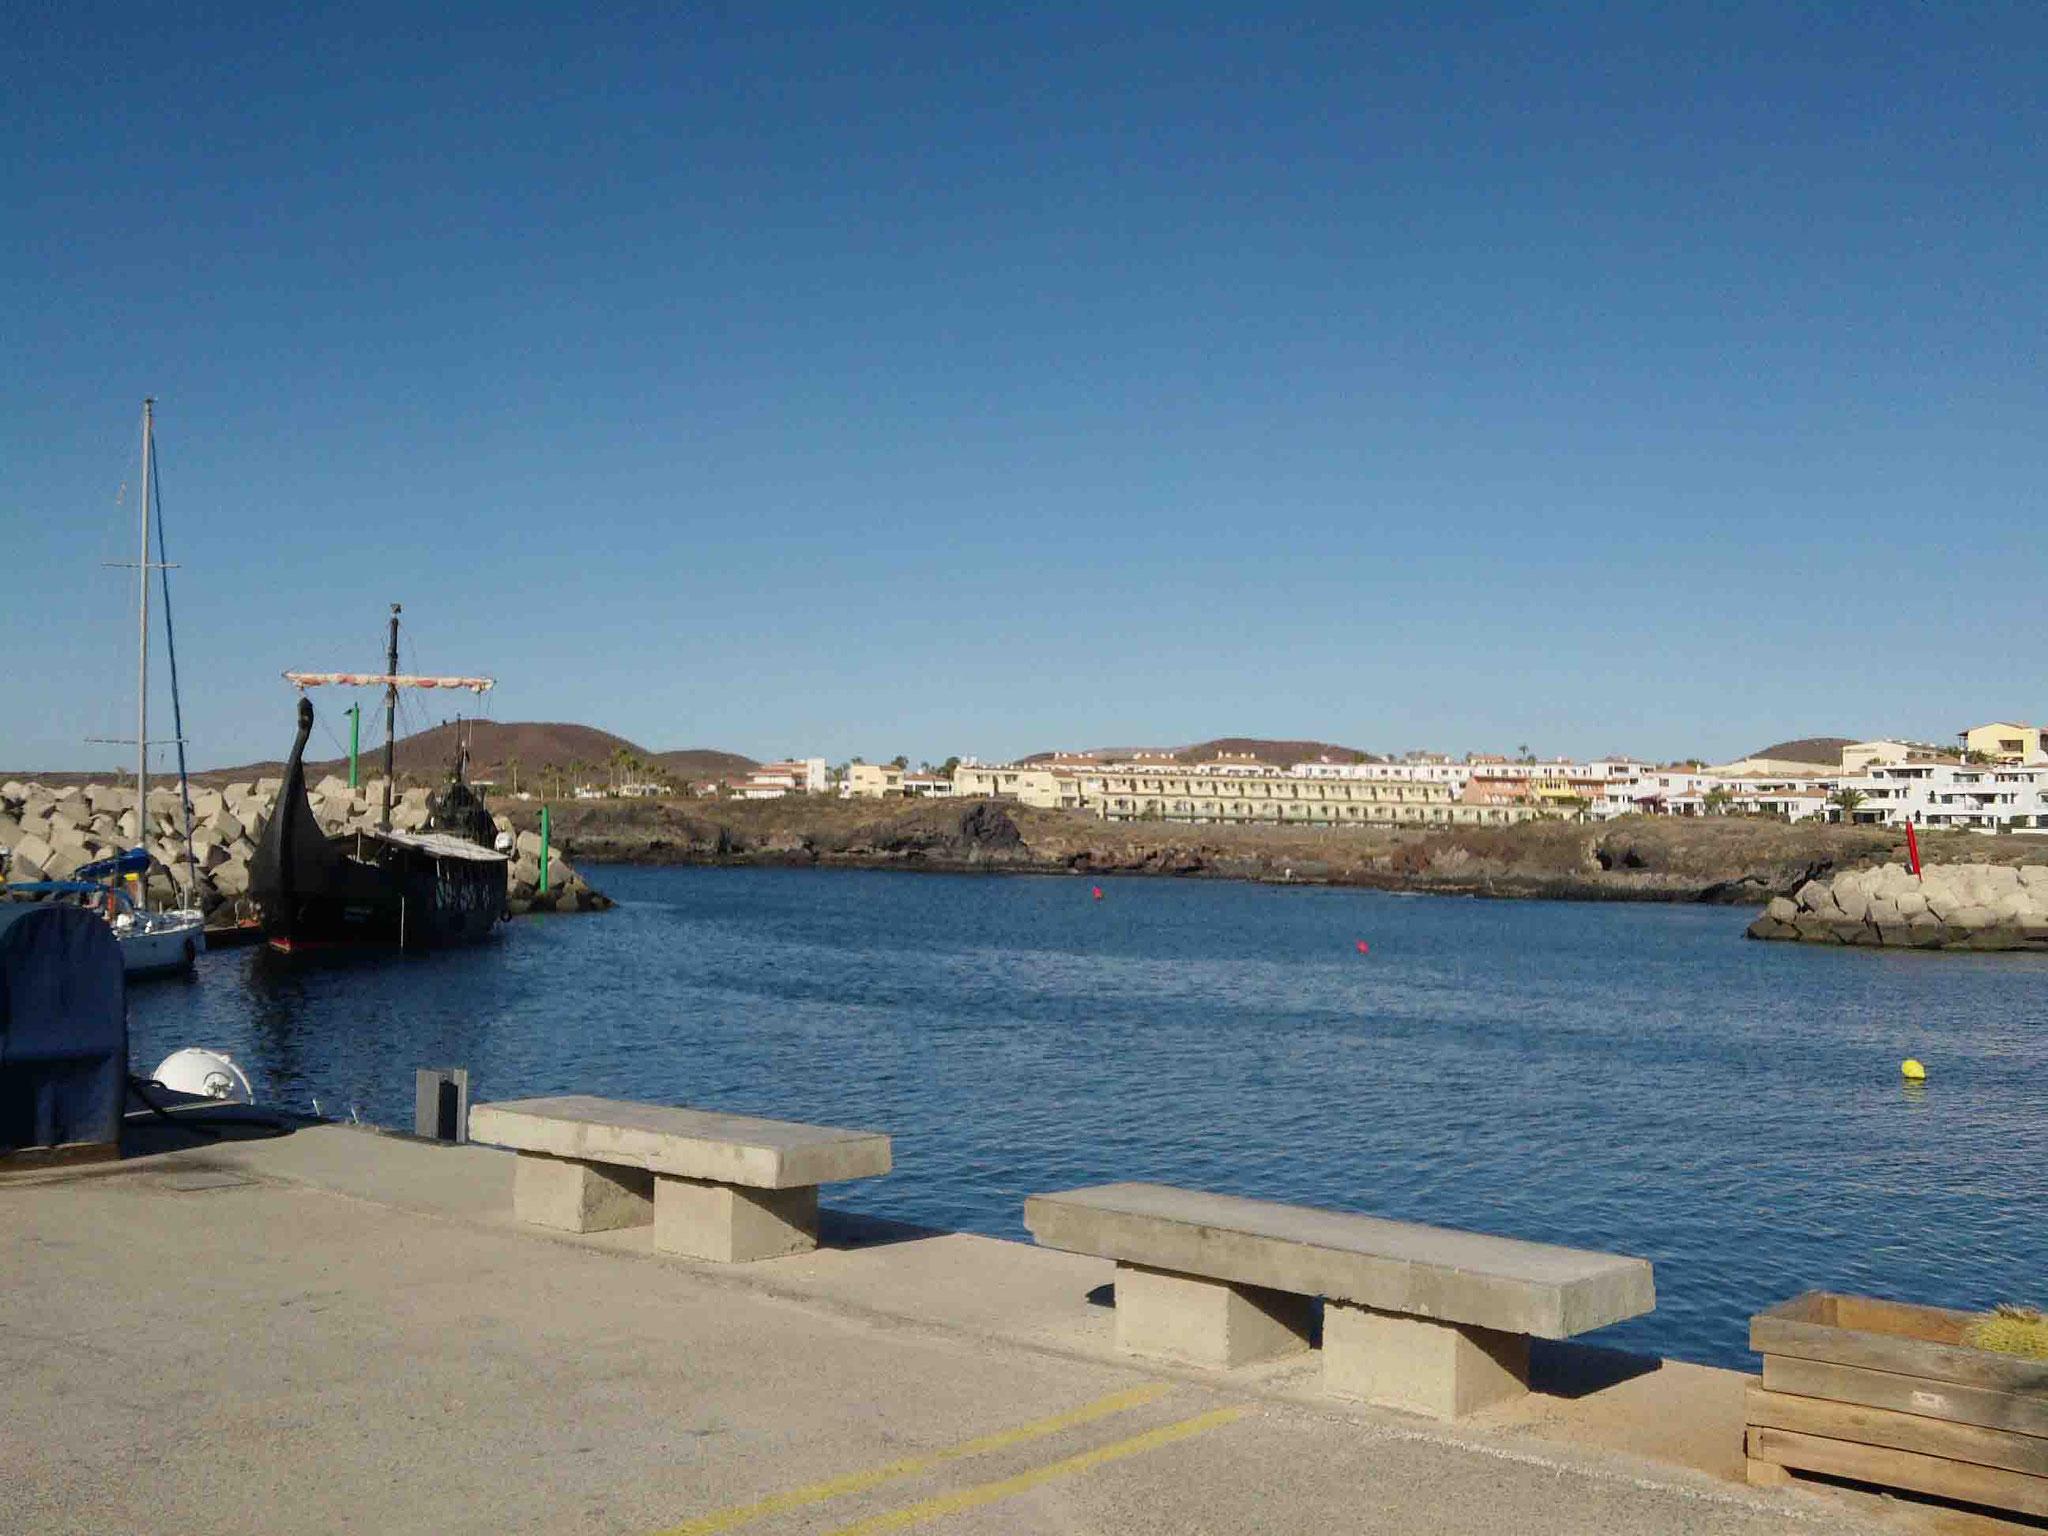 Hafenausfahrt Marina Saint Miguel - Teneriffa